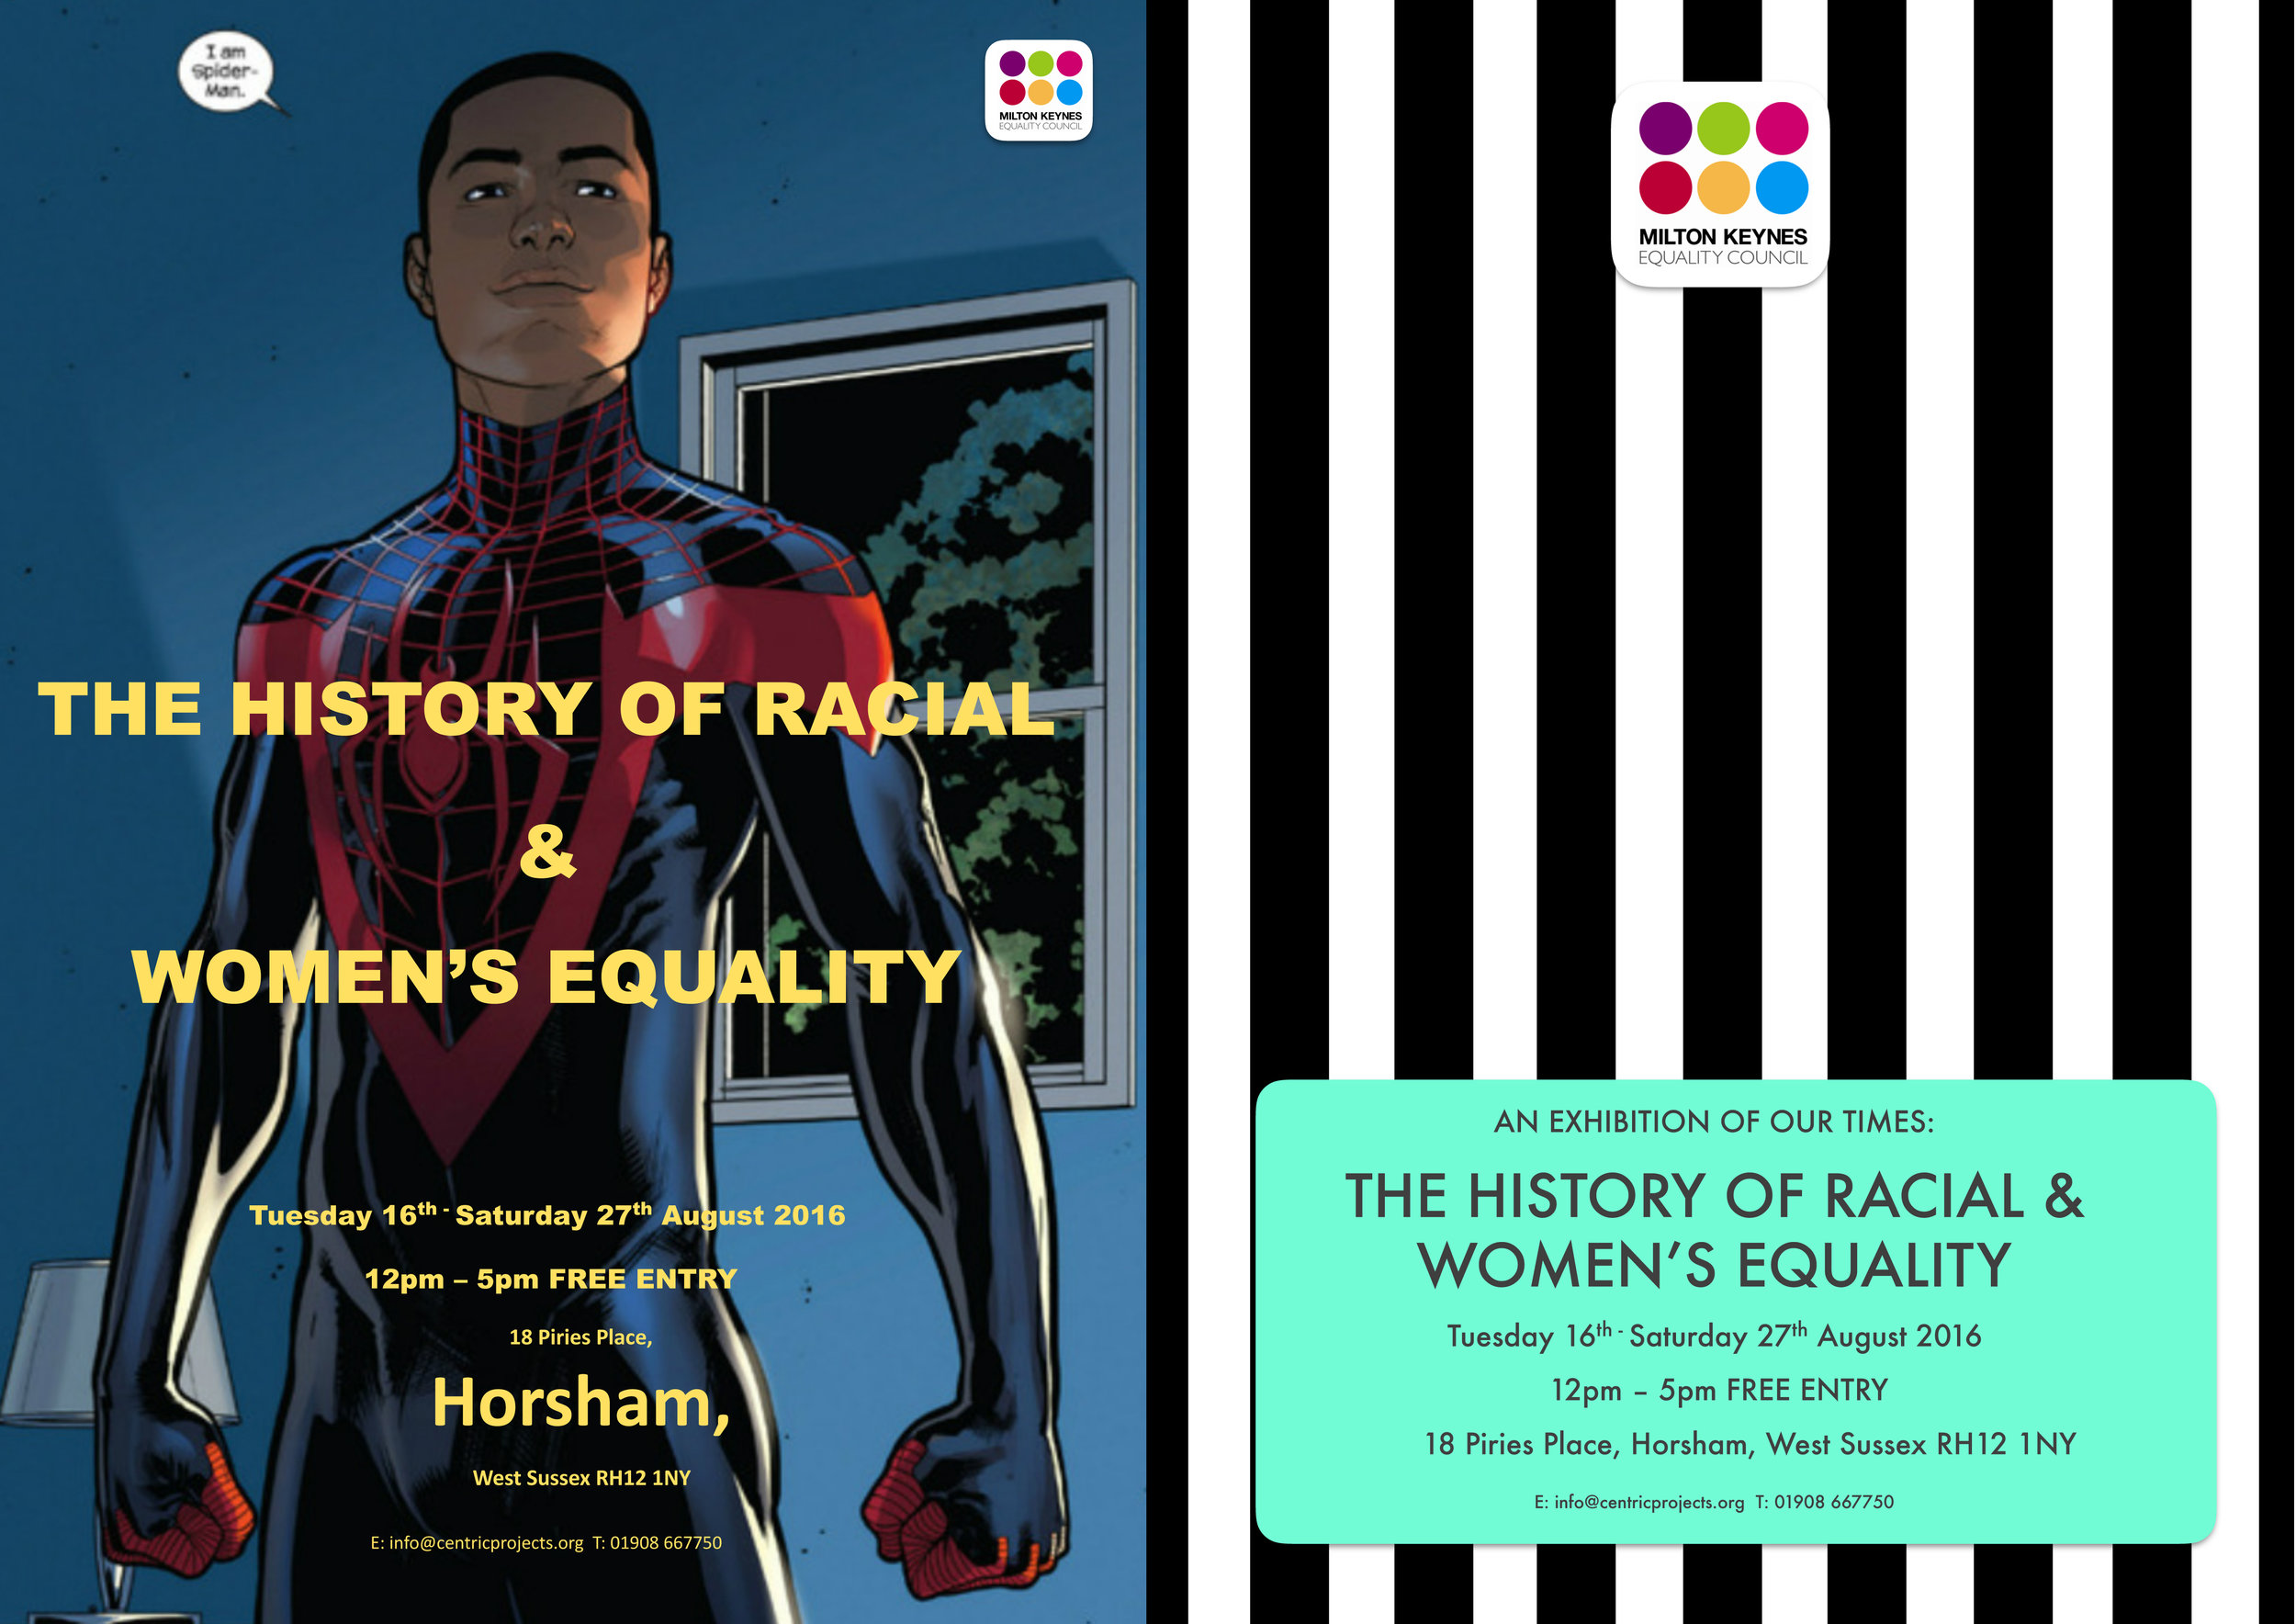 Horsham Posters 3.jpg